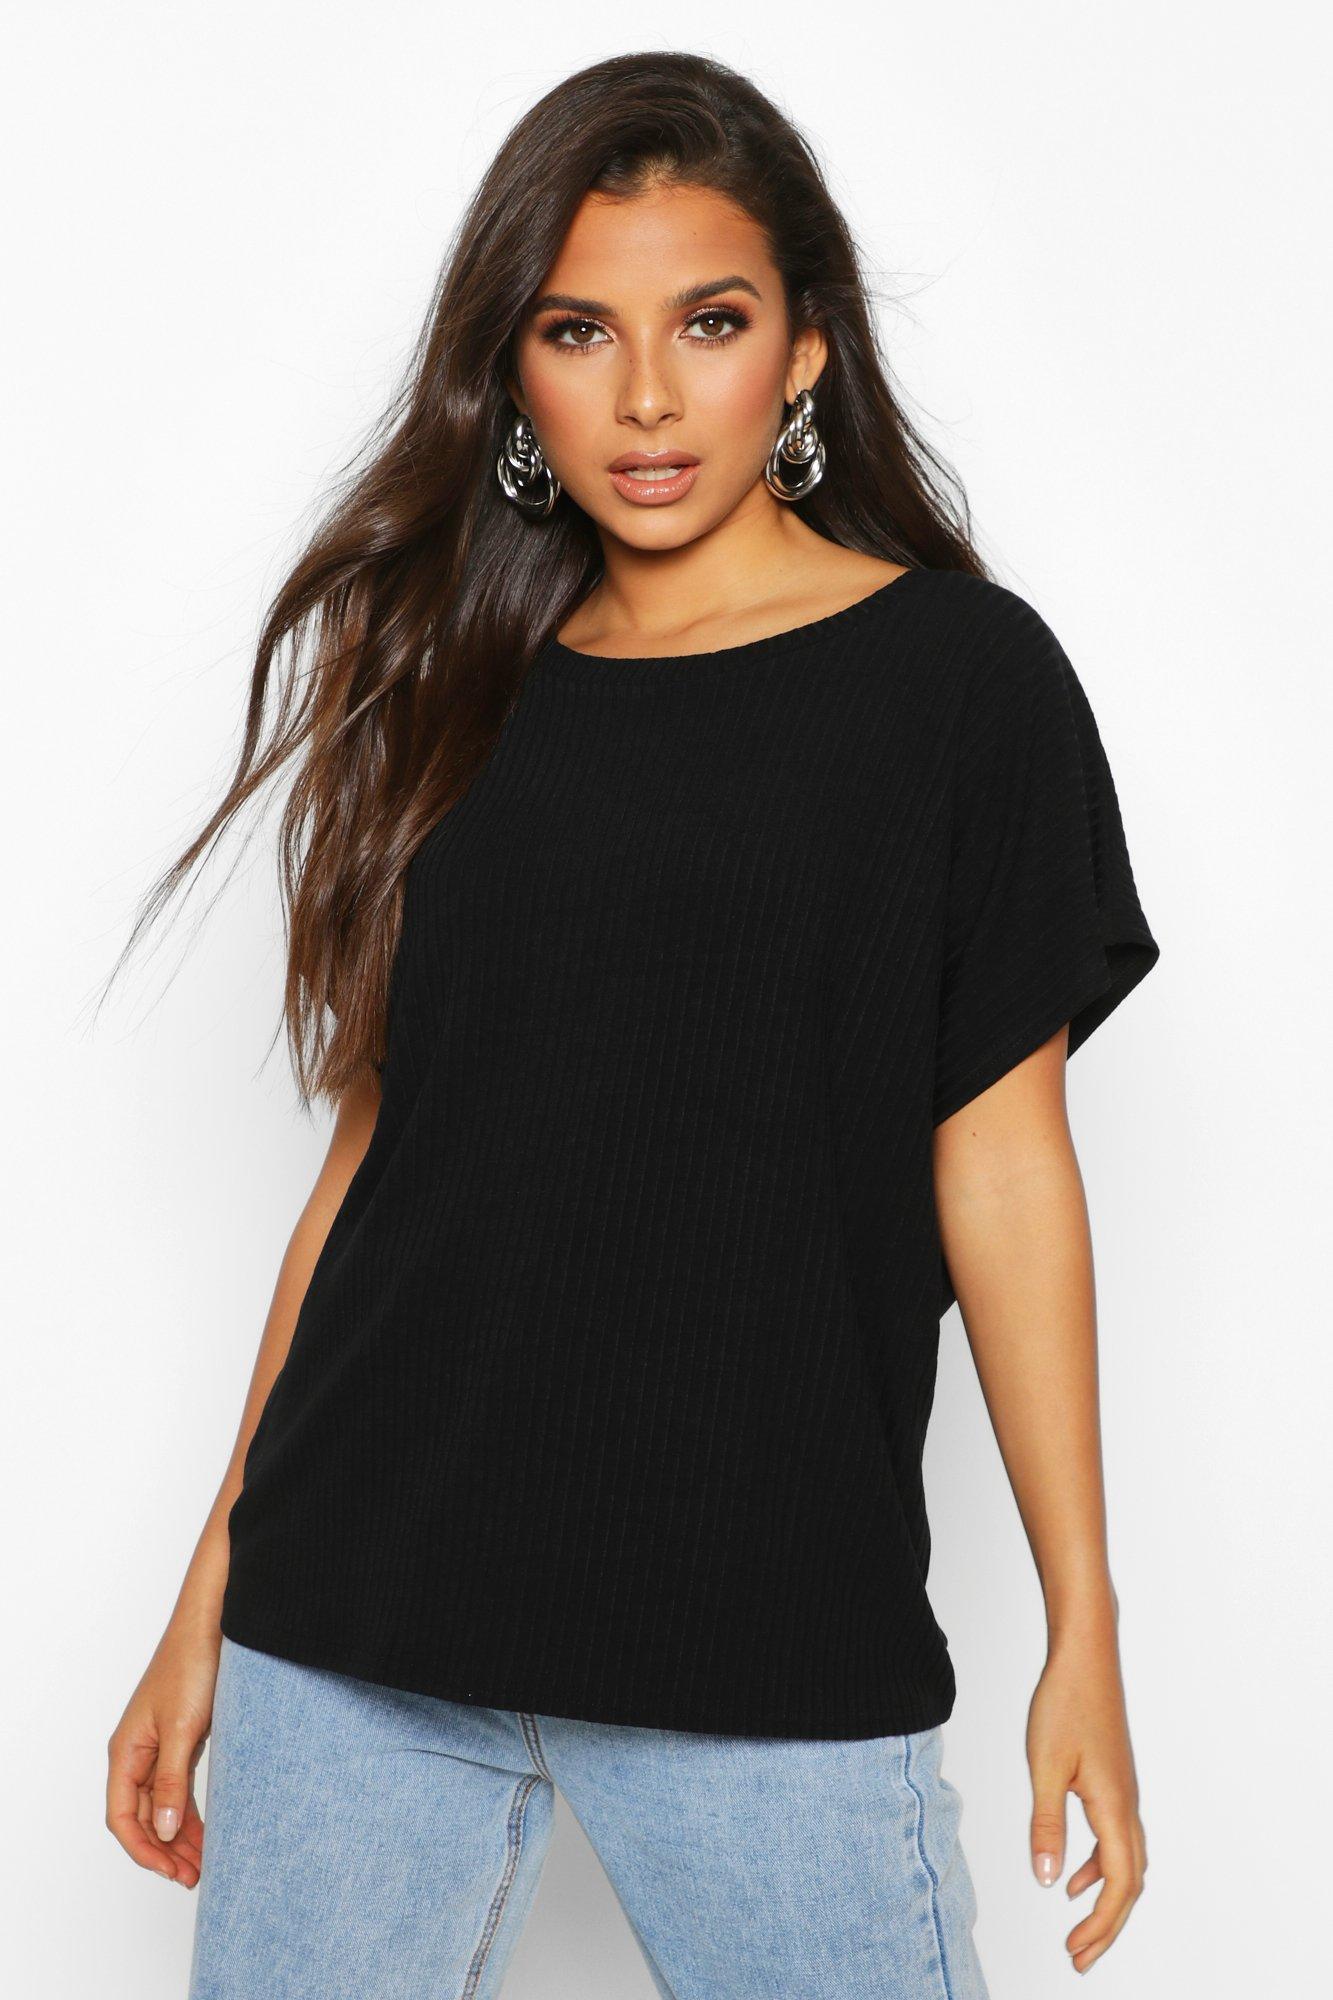 Womens Weich geripptes Oversized T-Shirt - schwarz - 32, Schwarz - Boohoo.com